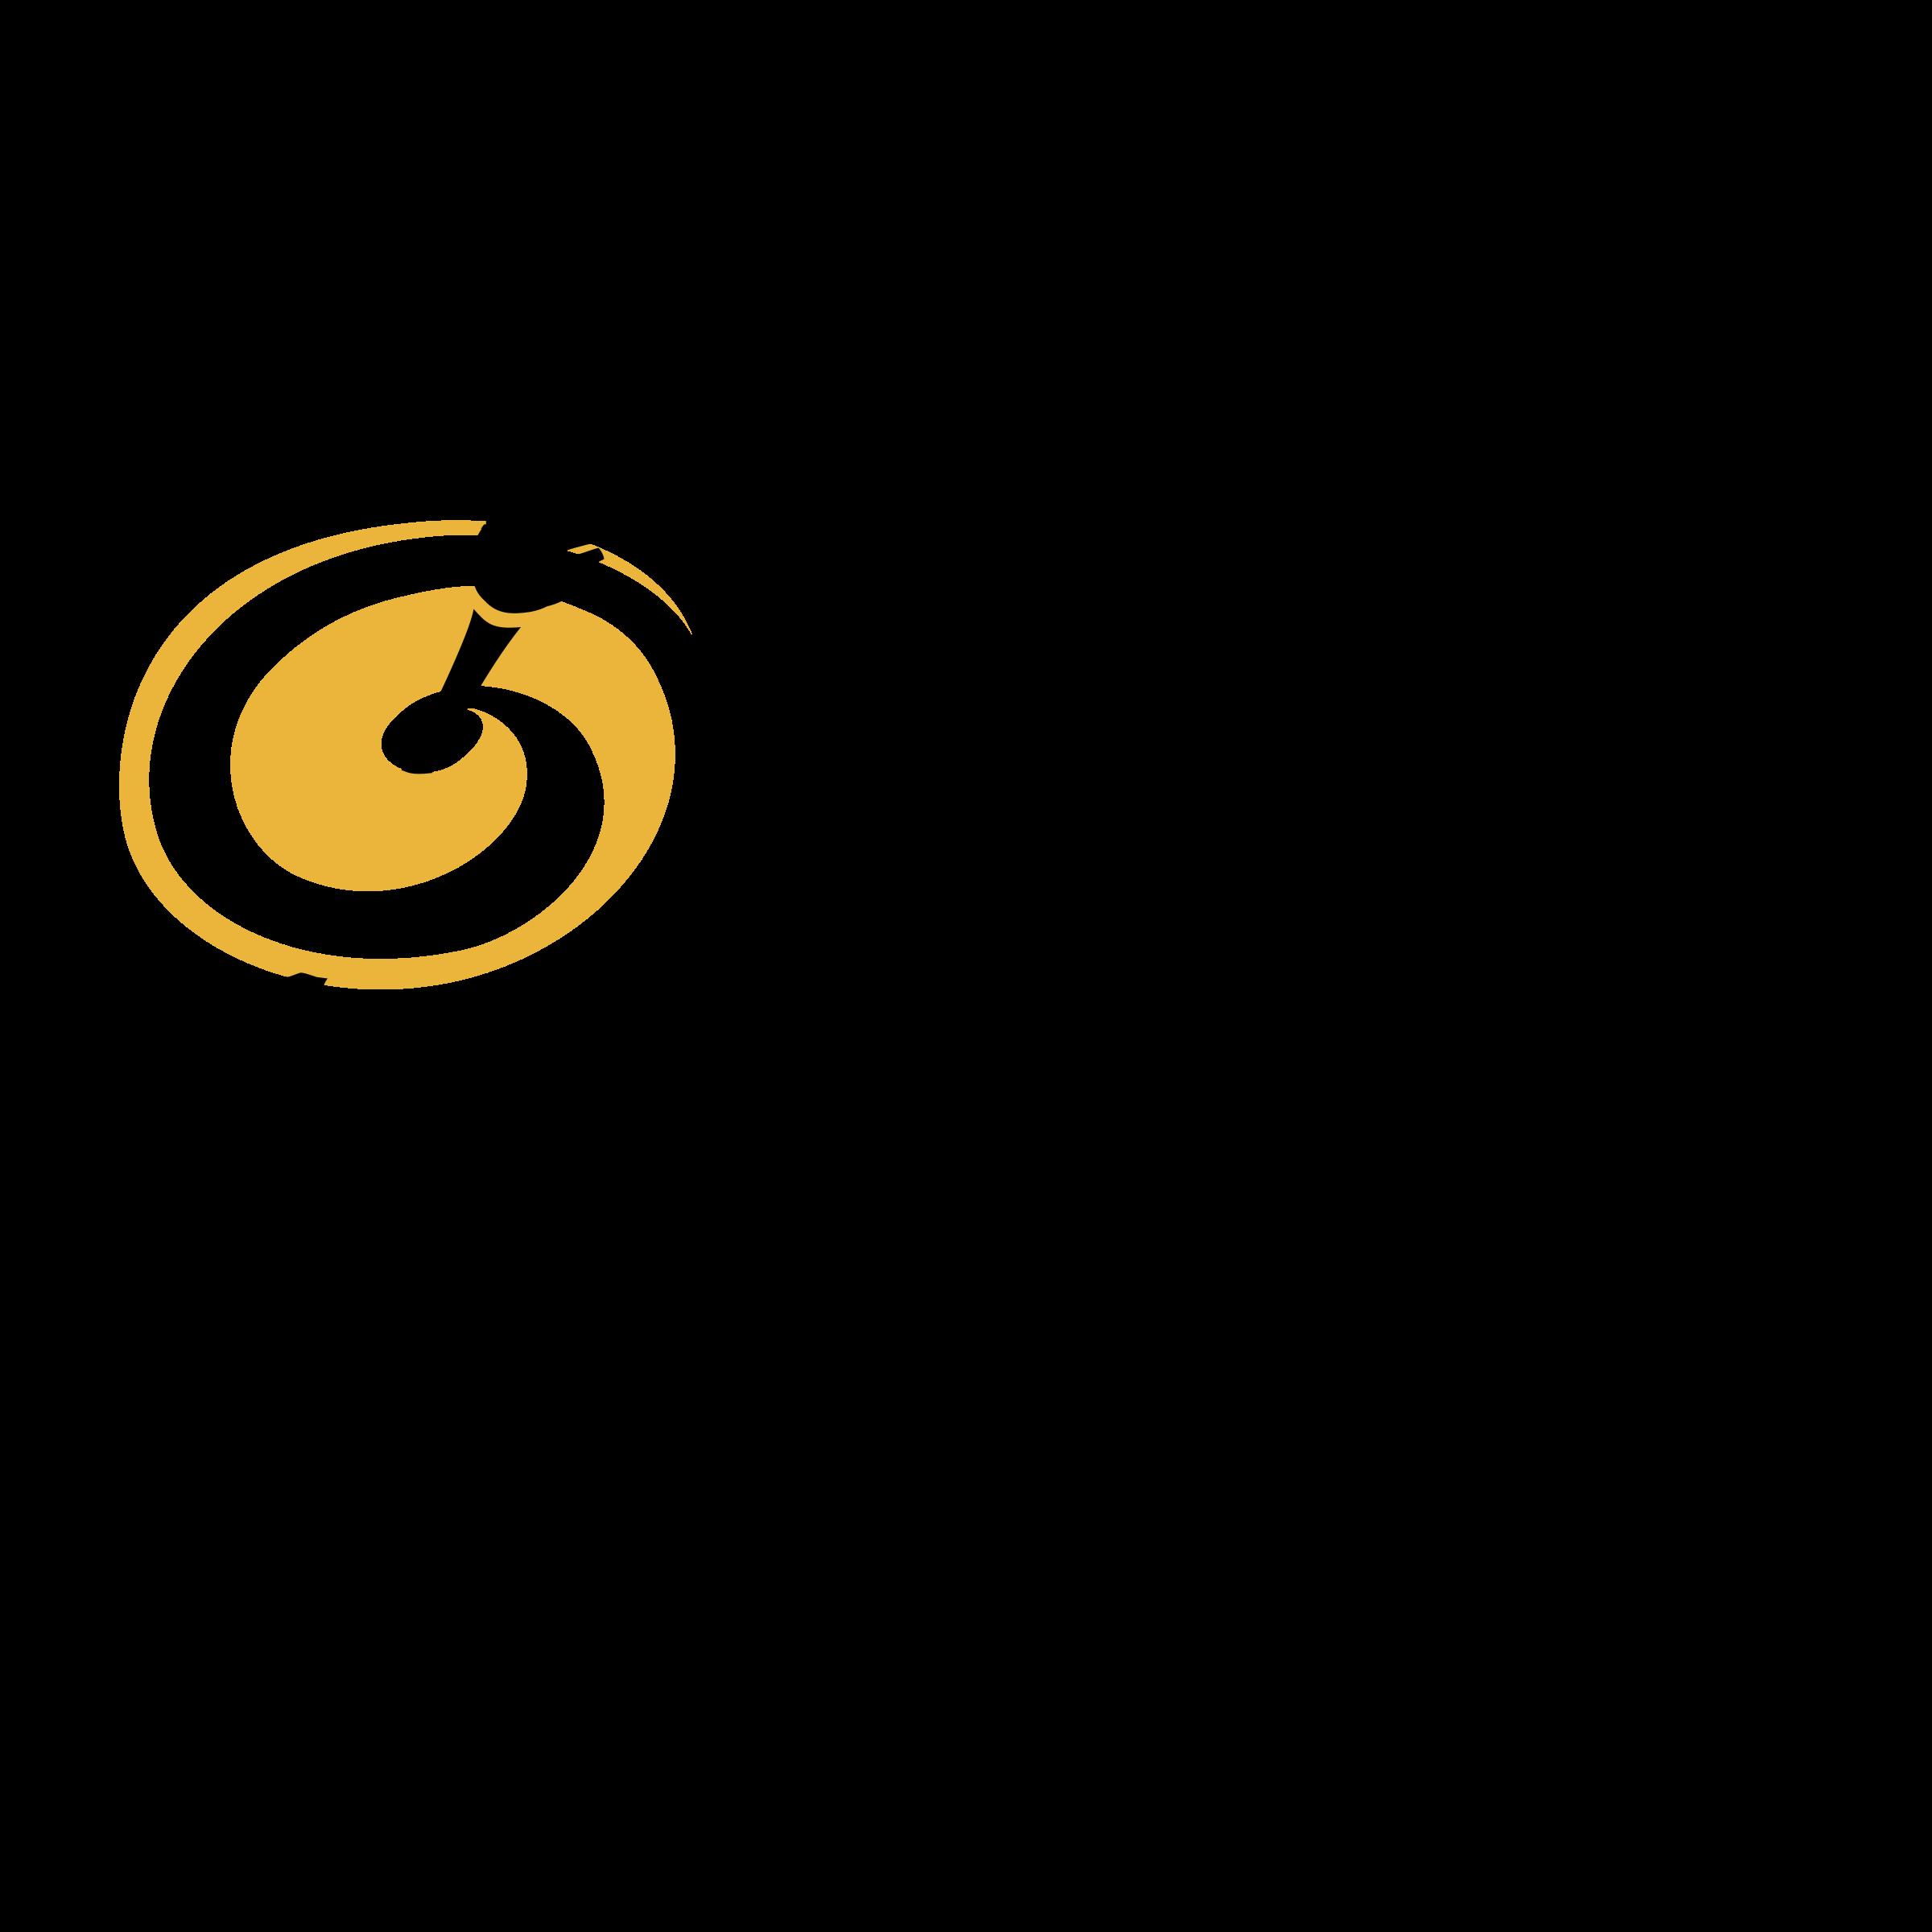 Psg Investment Bank Logo Png Transparent Svg Vector Freebie Supply